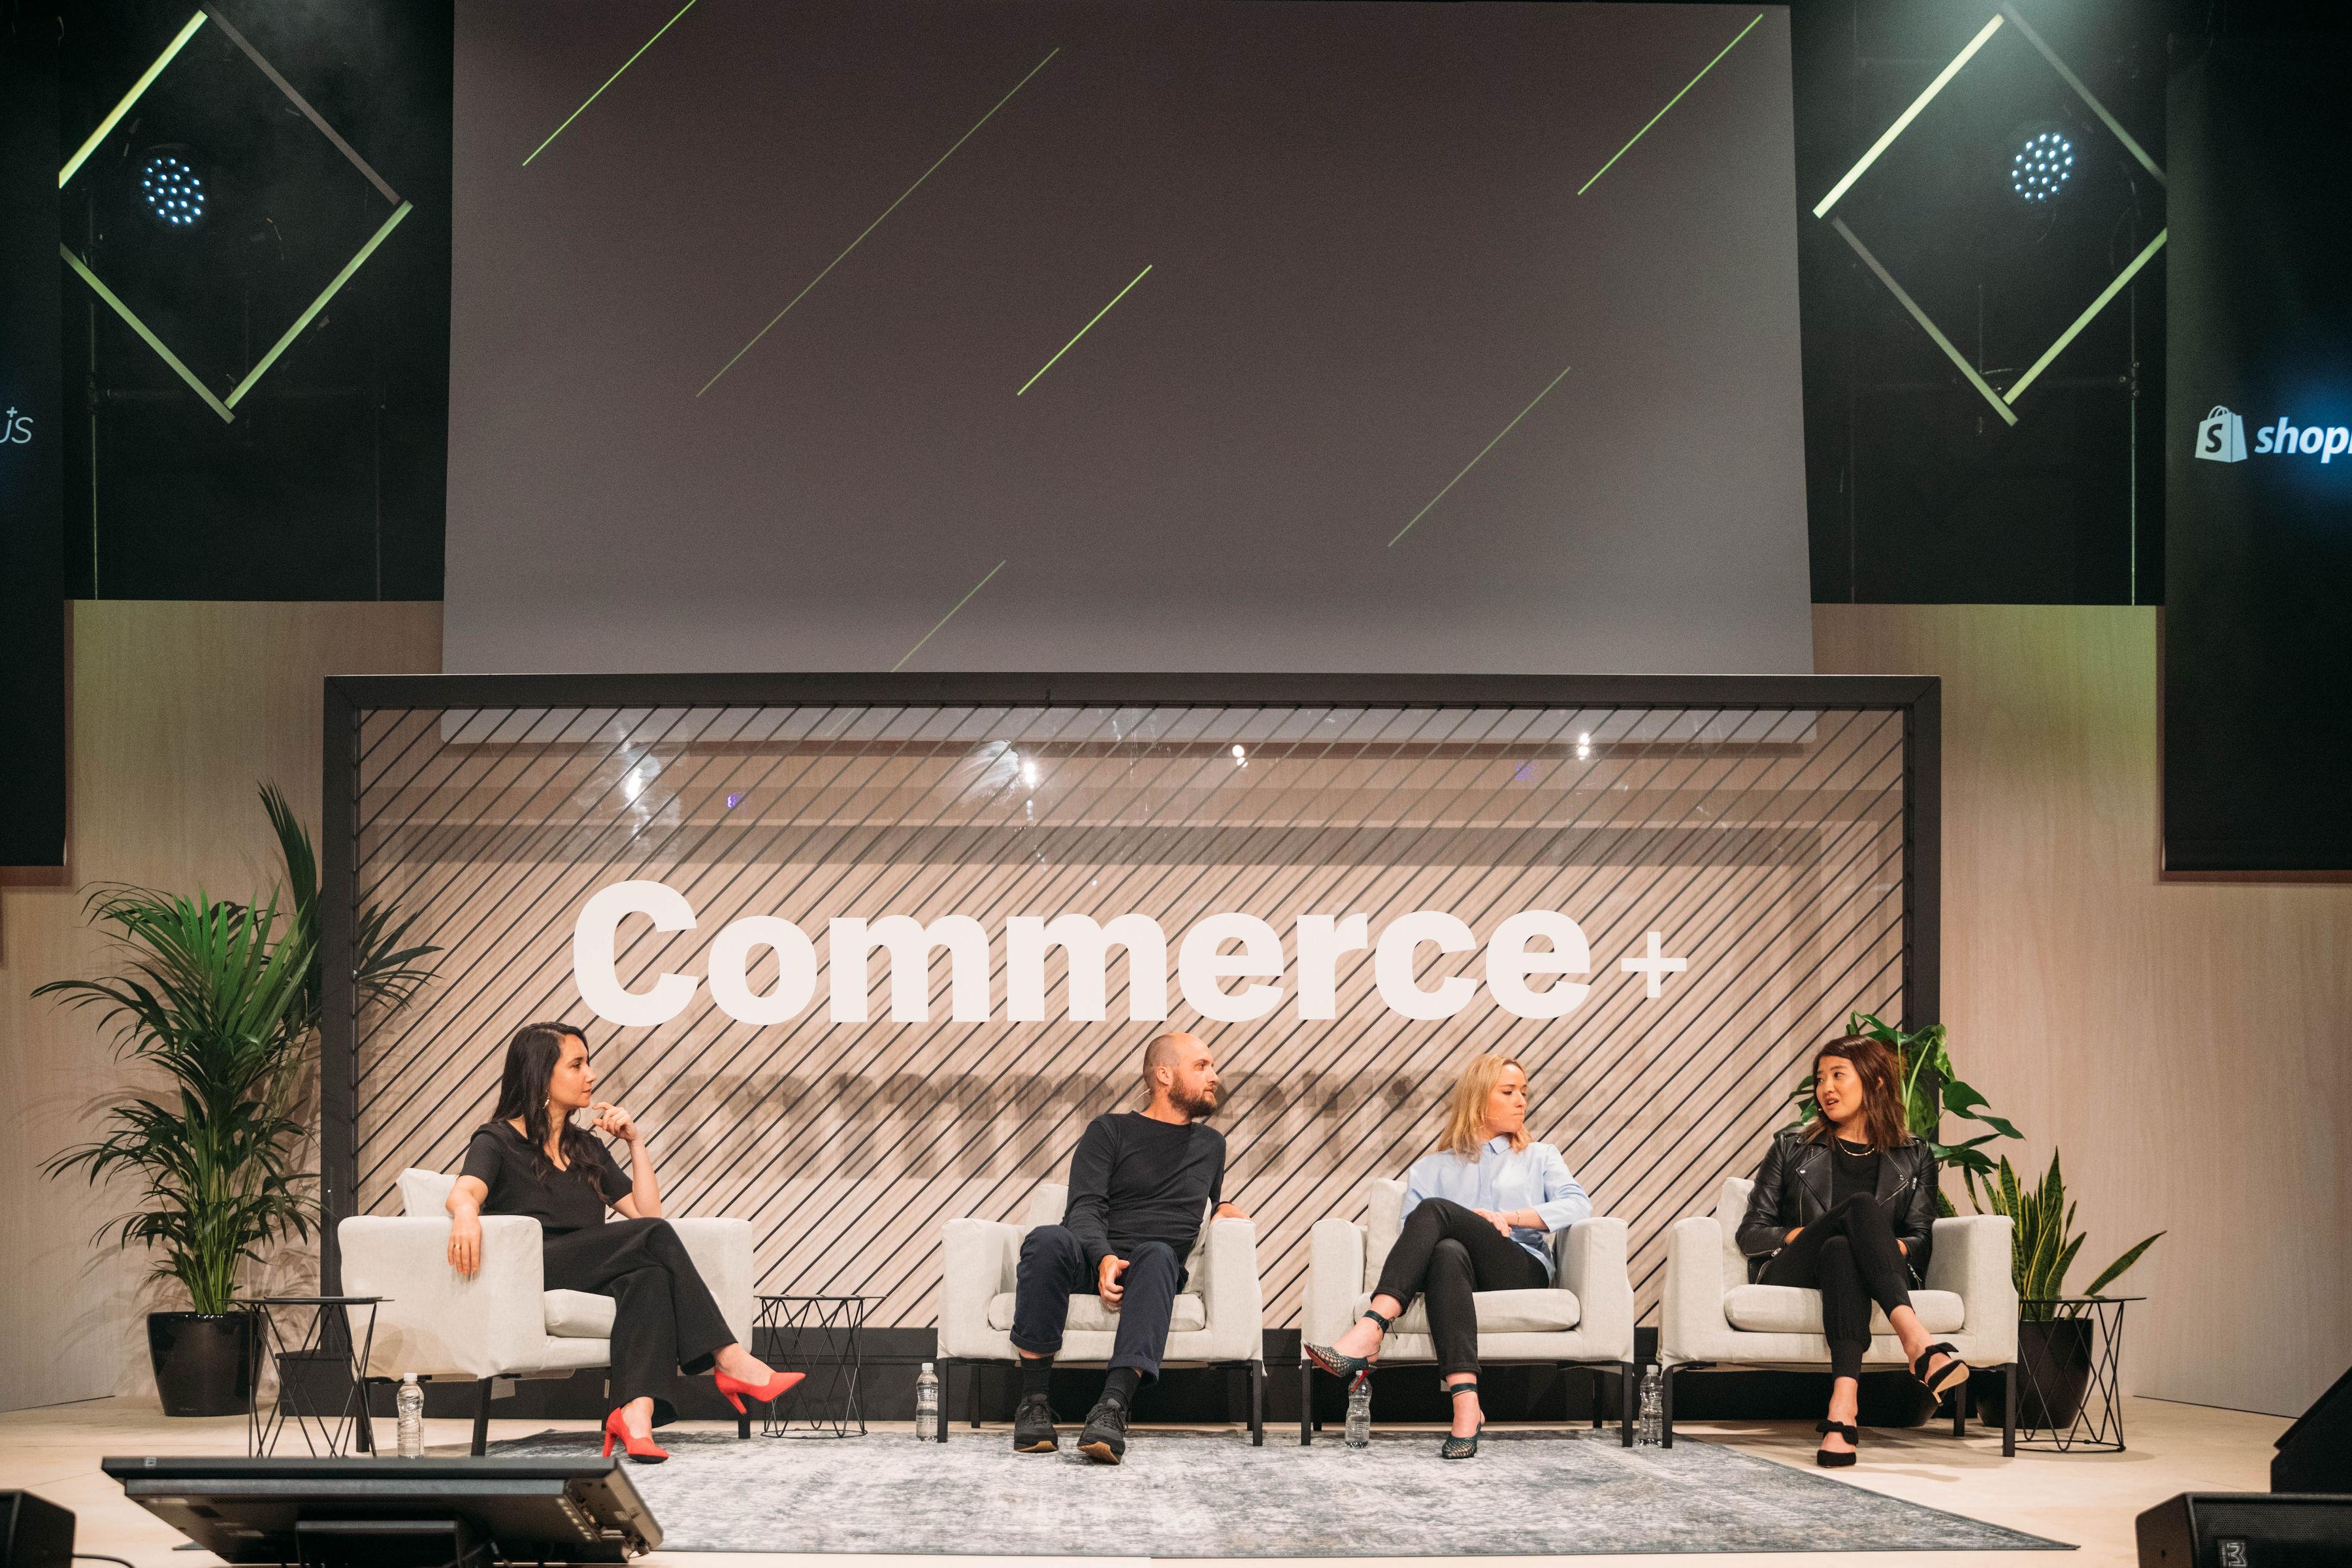 Shopify's Commerce plus event